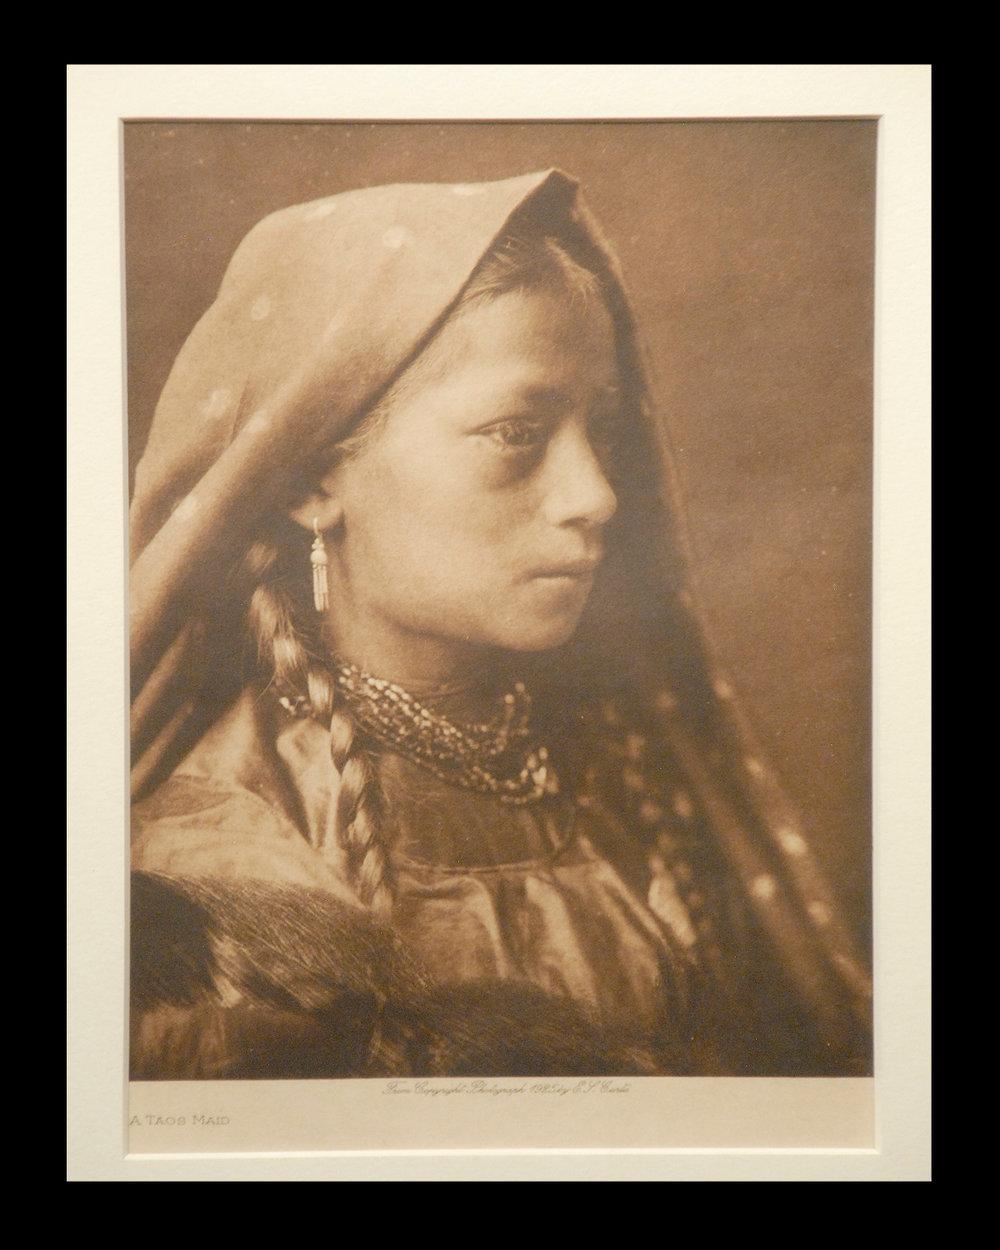 """A Taos Maid"" Vol.16 1925 Vellum Print      Vintage Photogravure"